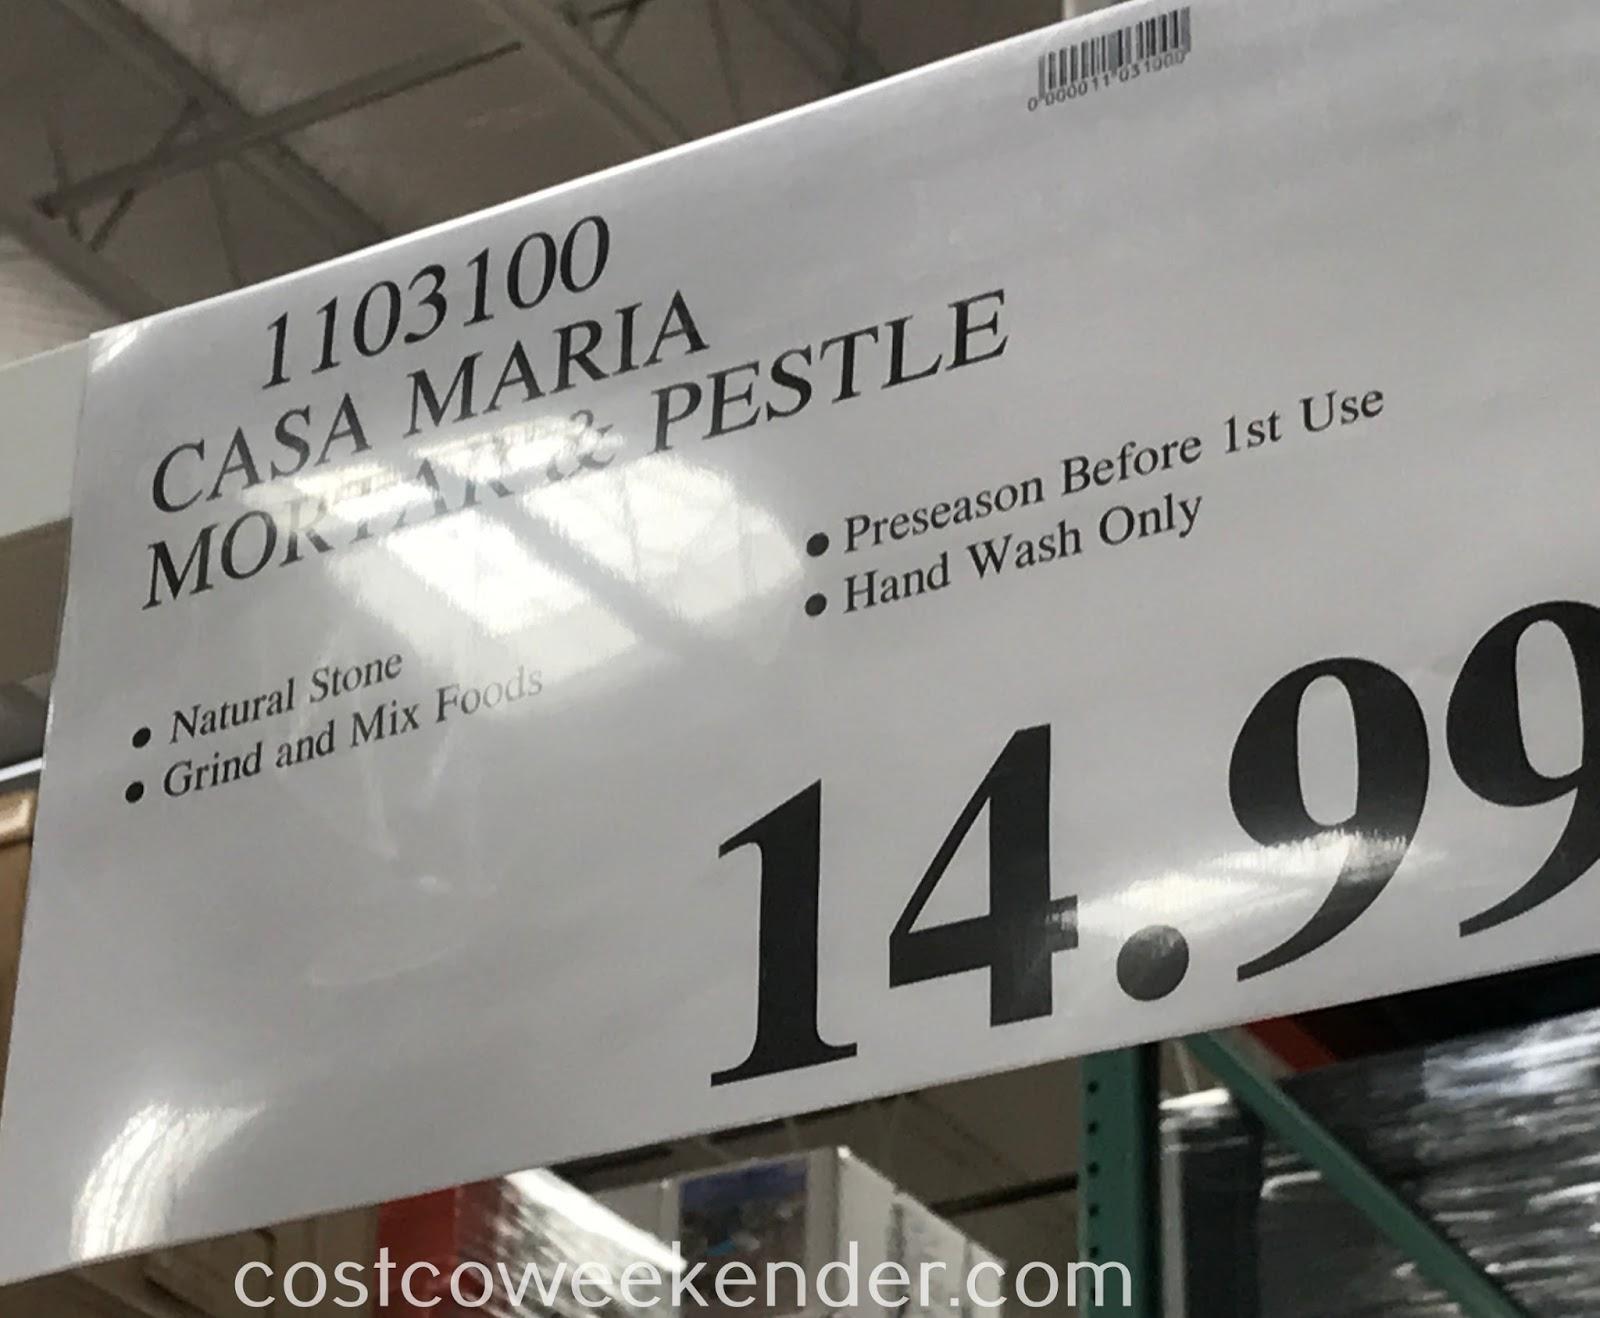 Deal for the Casa Maria Molcajete at Costco